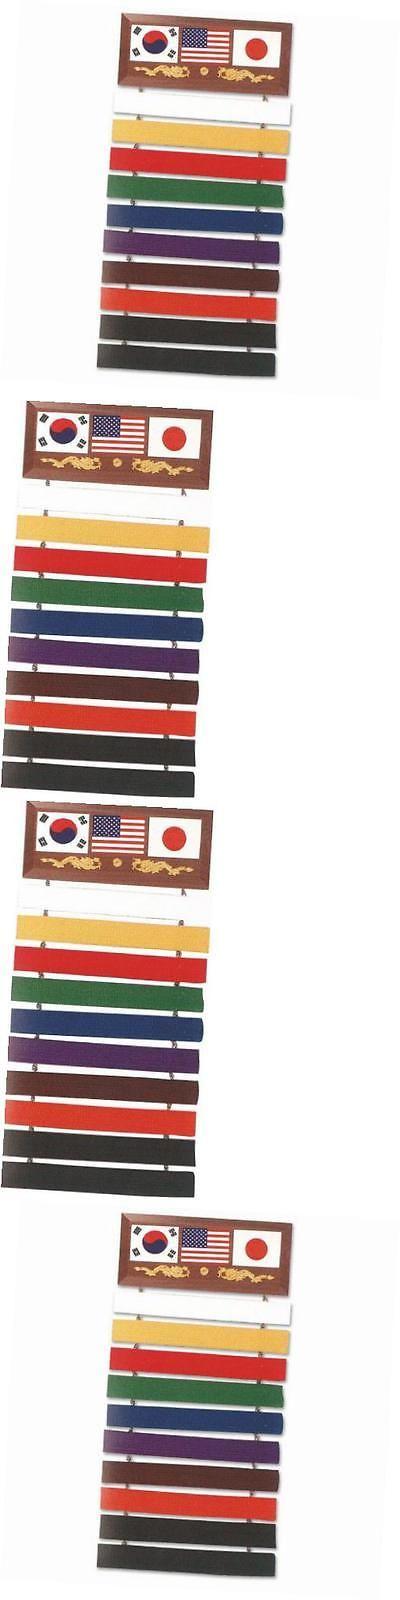 Belt Displays 179768: Se-007 10 Karate Belt Display Wood Rack -> BUY IT NOW ONLY: $31.14 on eBay!